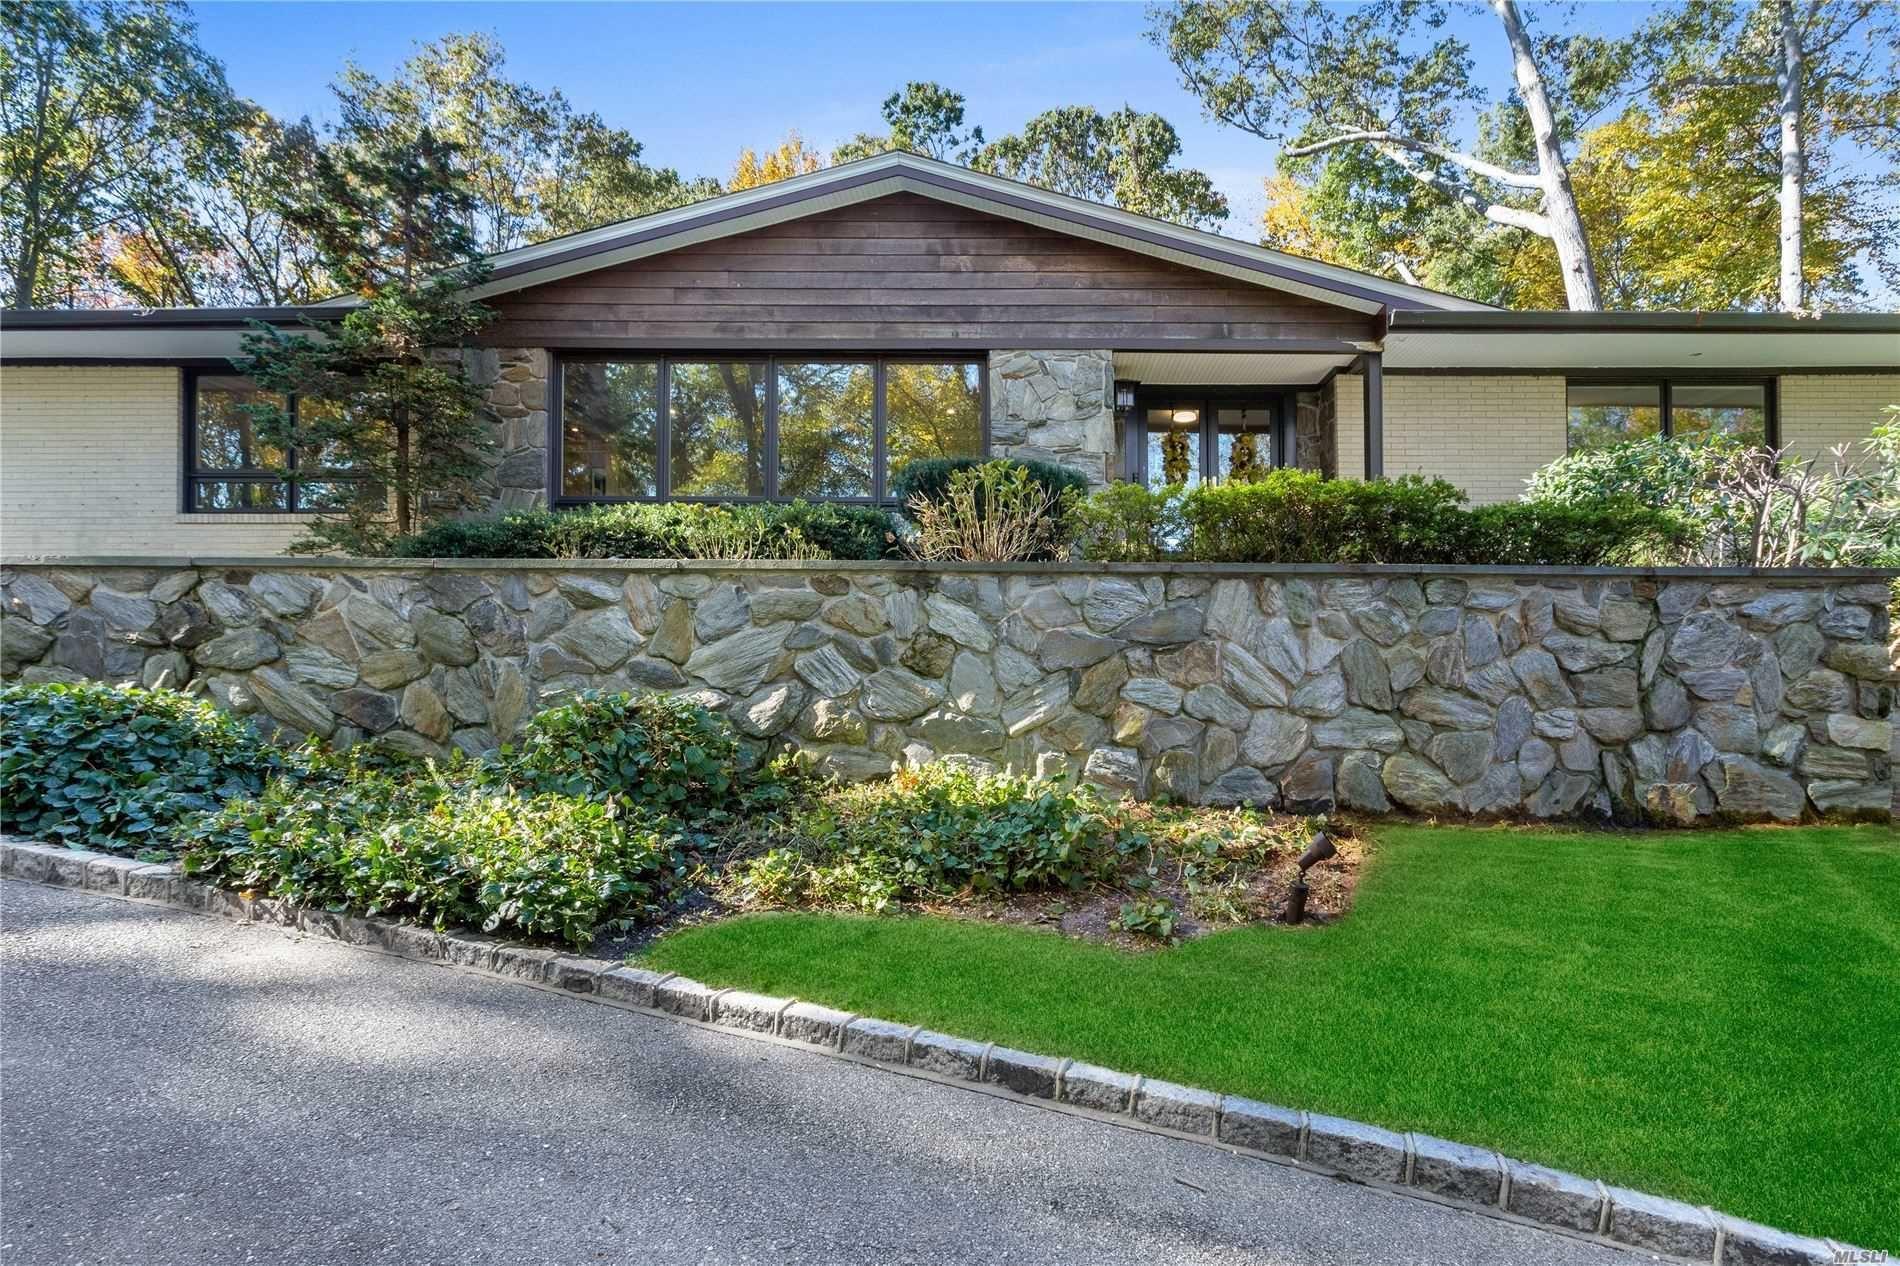 Photo of 339 Ridge Lane, Mill Neck, NY 11765 (MLS # 3191674)